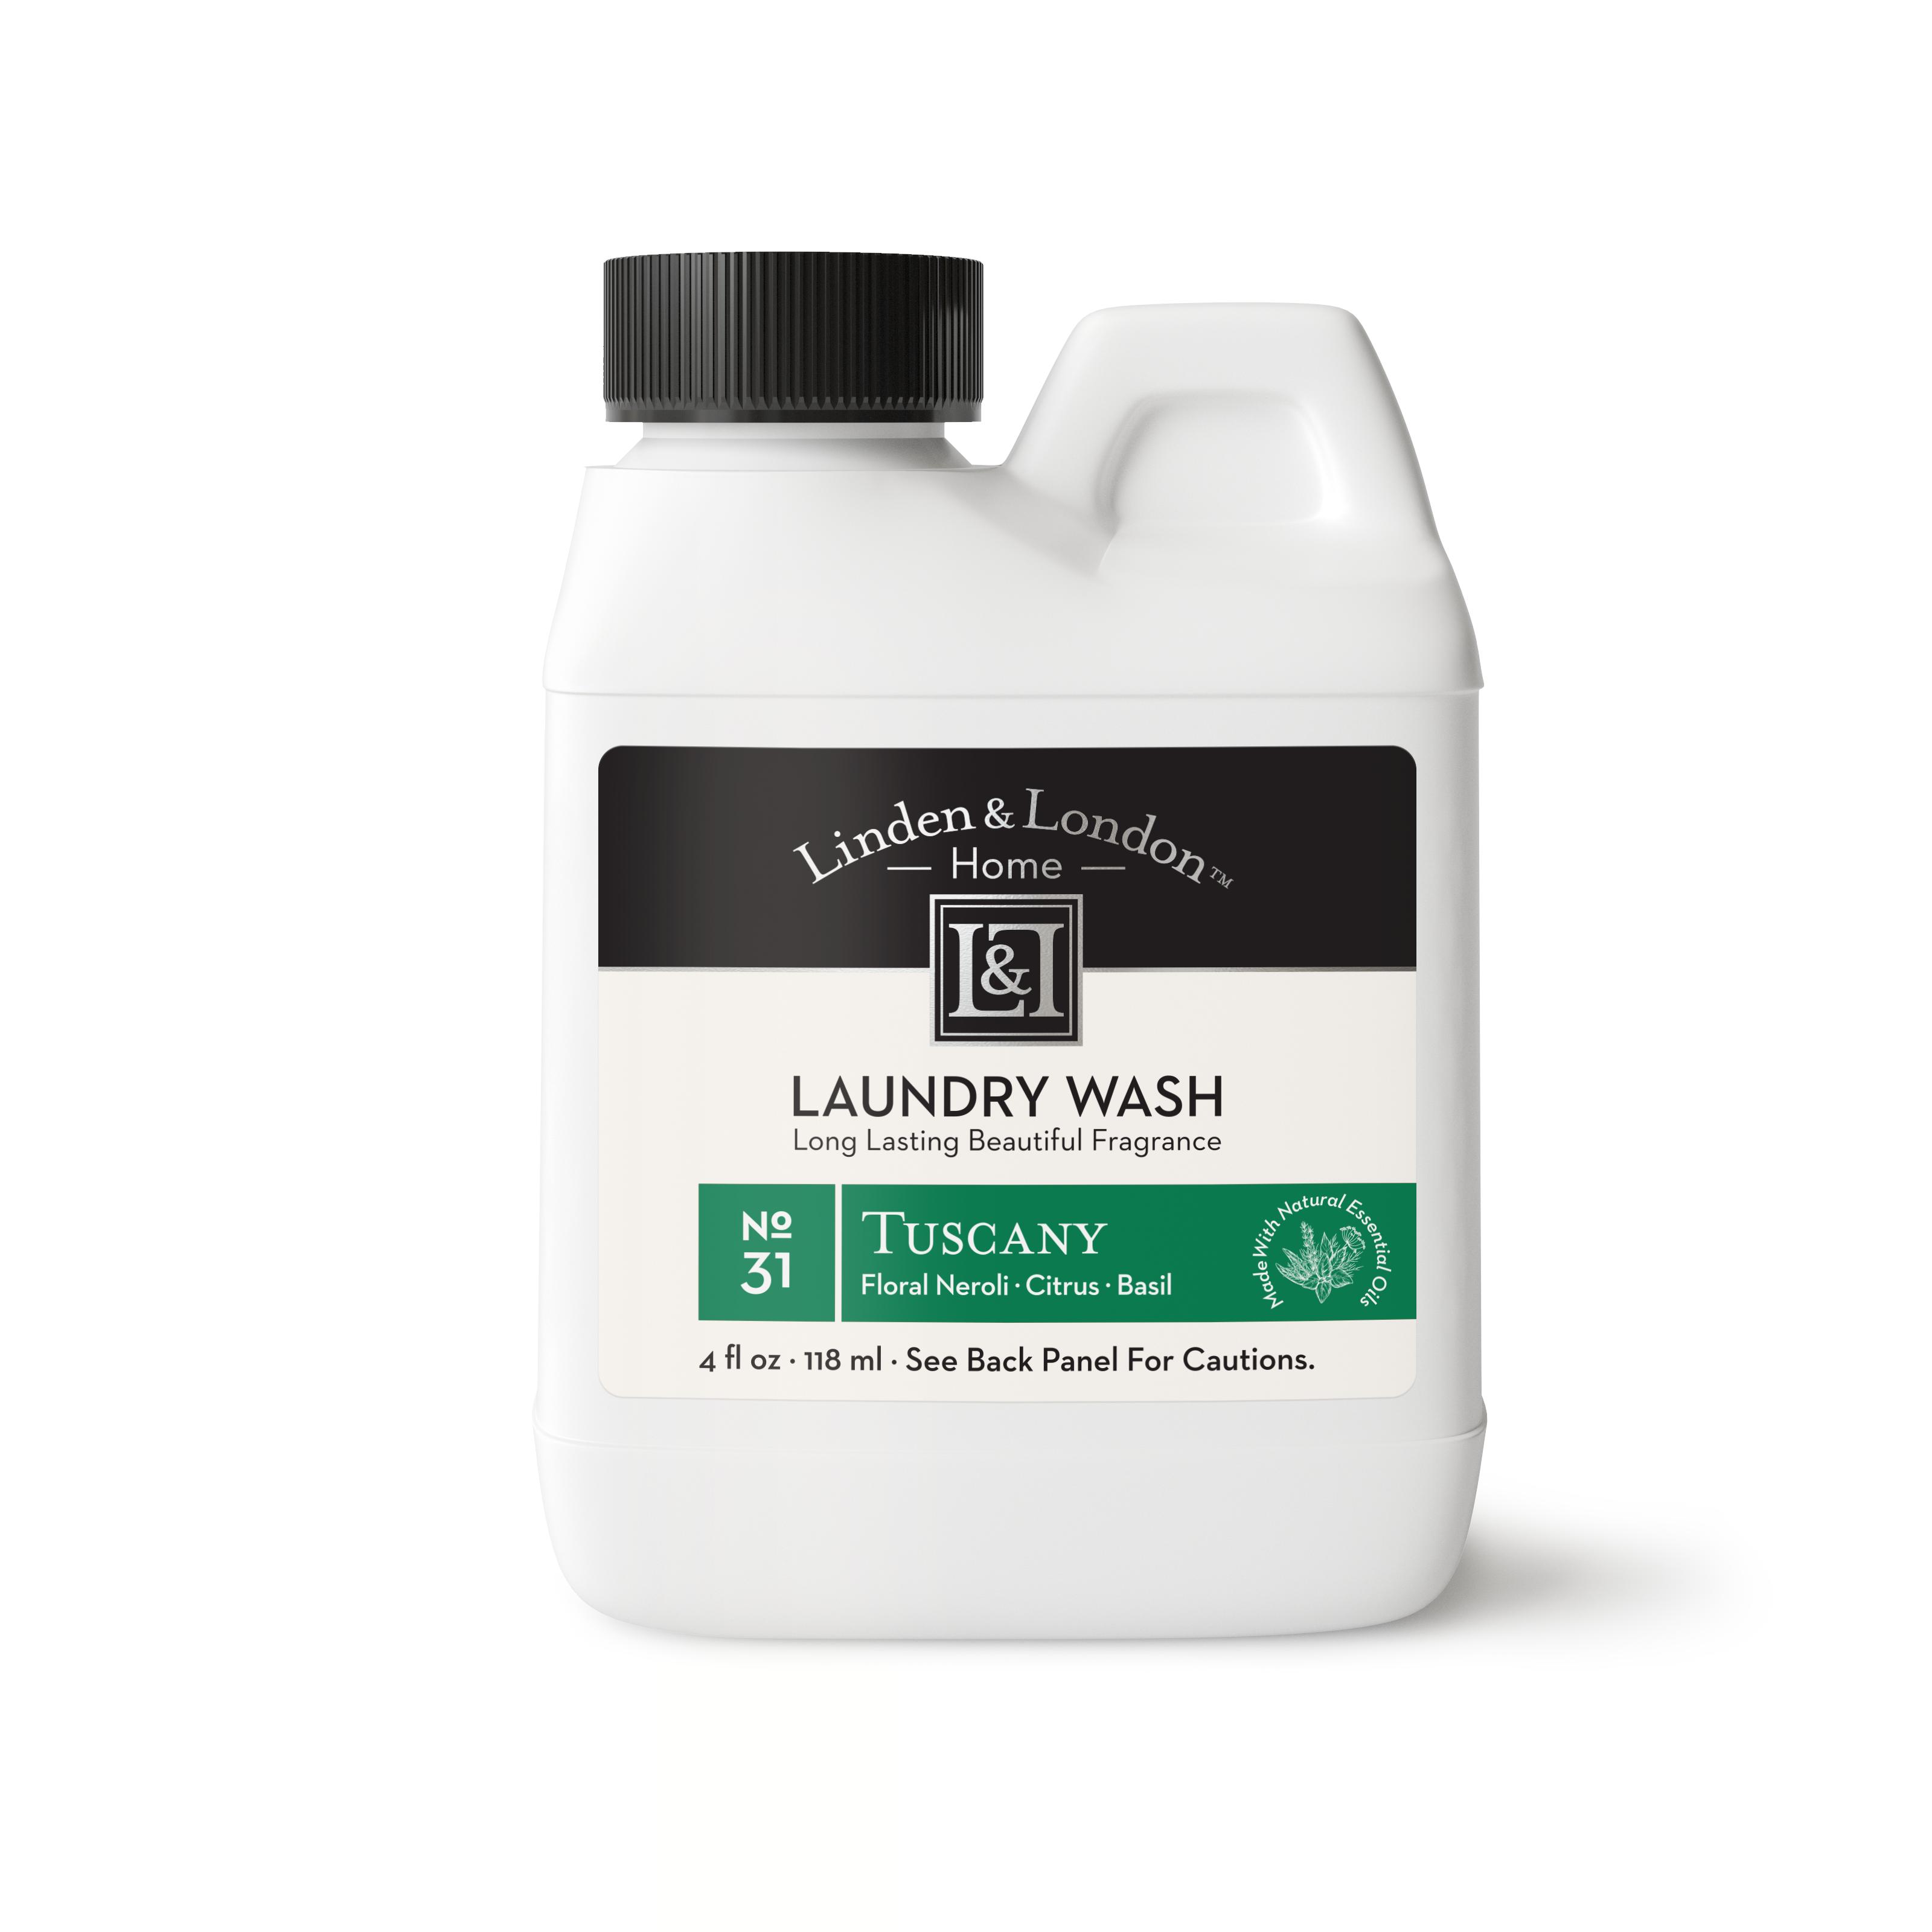 Linden & London Laundry Wash -  fragrance